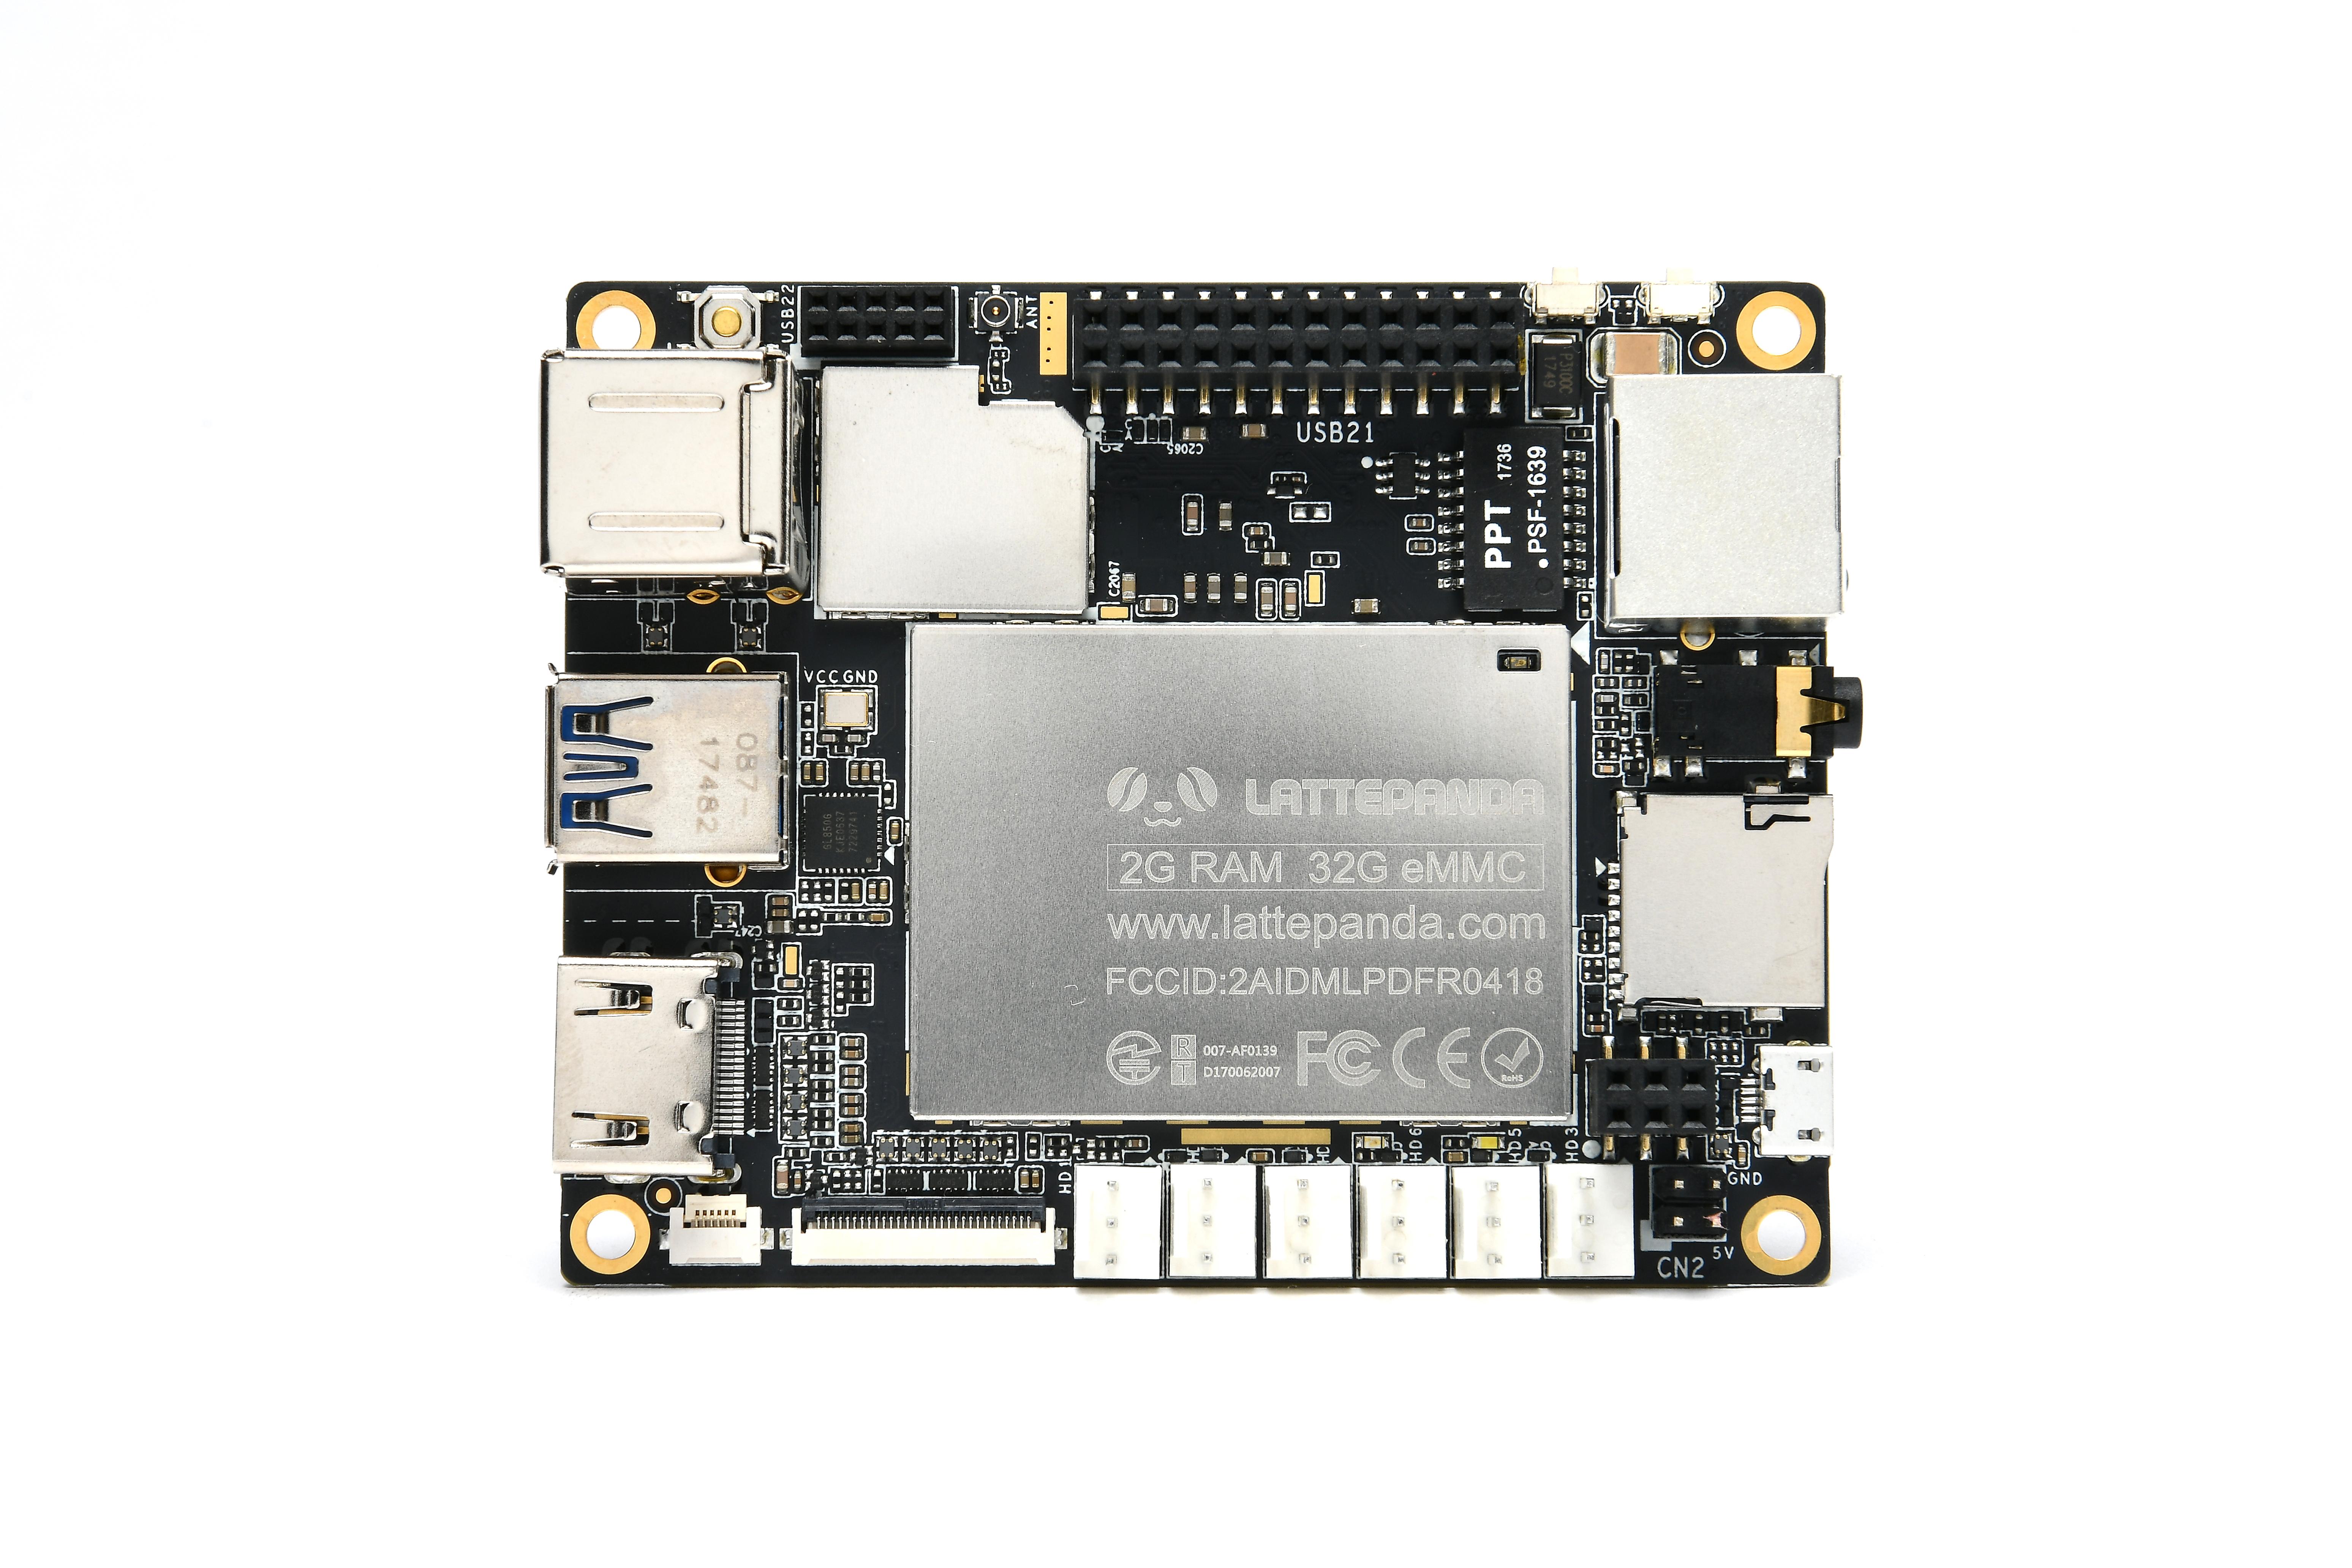 LattePanda (2G/32Gb) With Win10 License